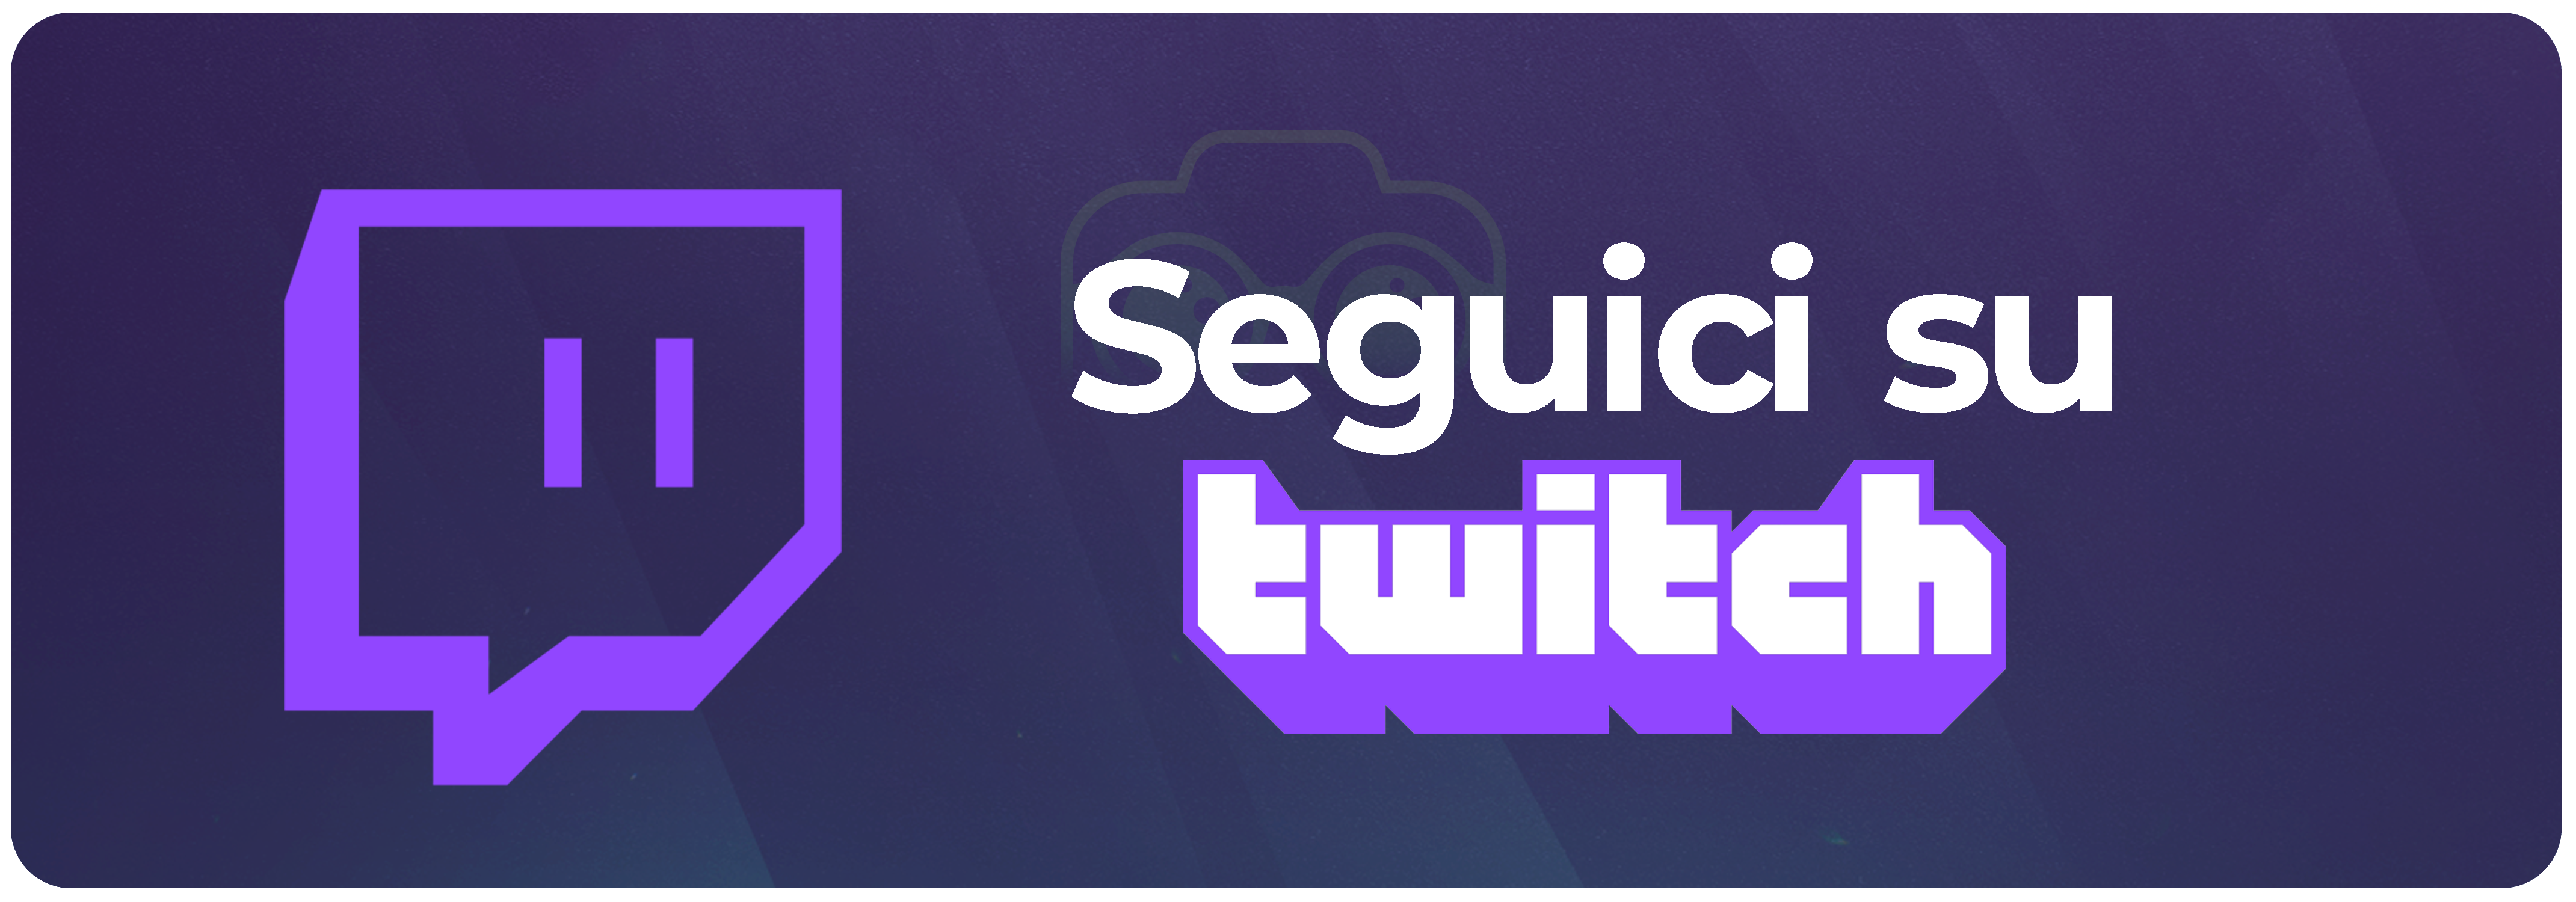 Seguici su Twitch